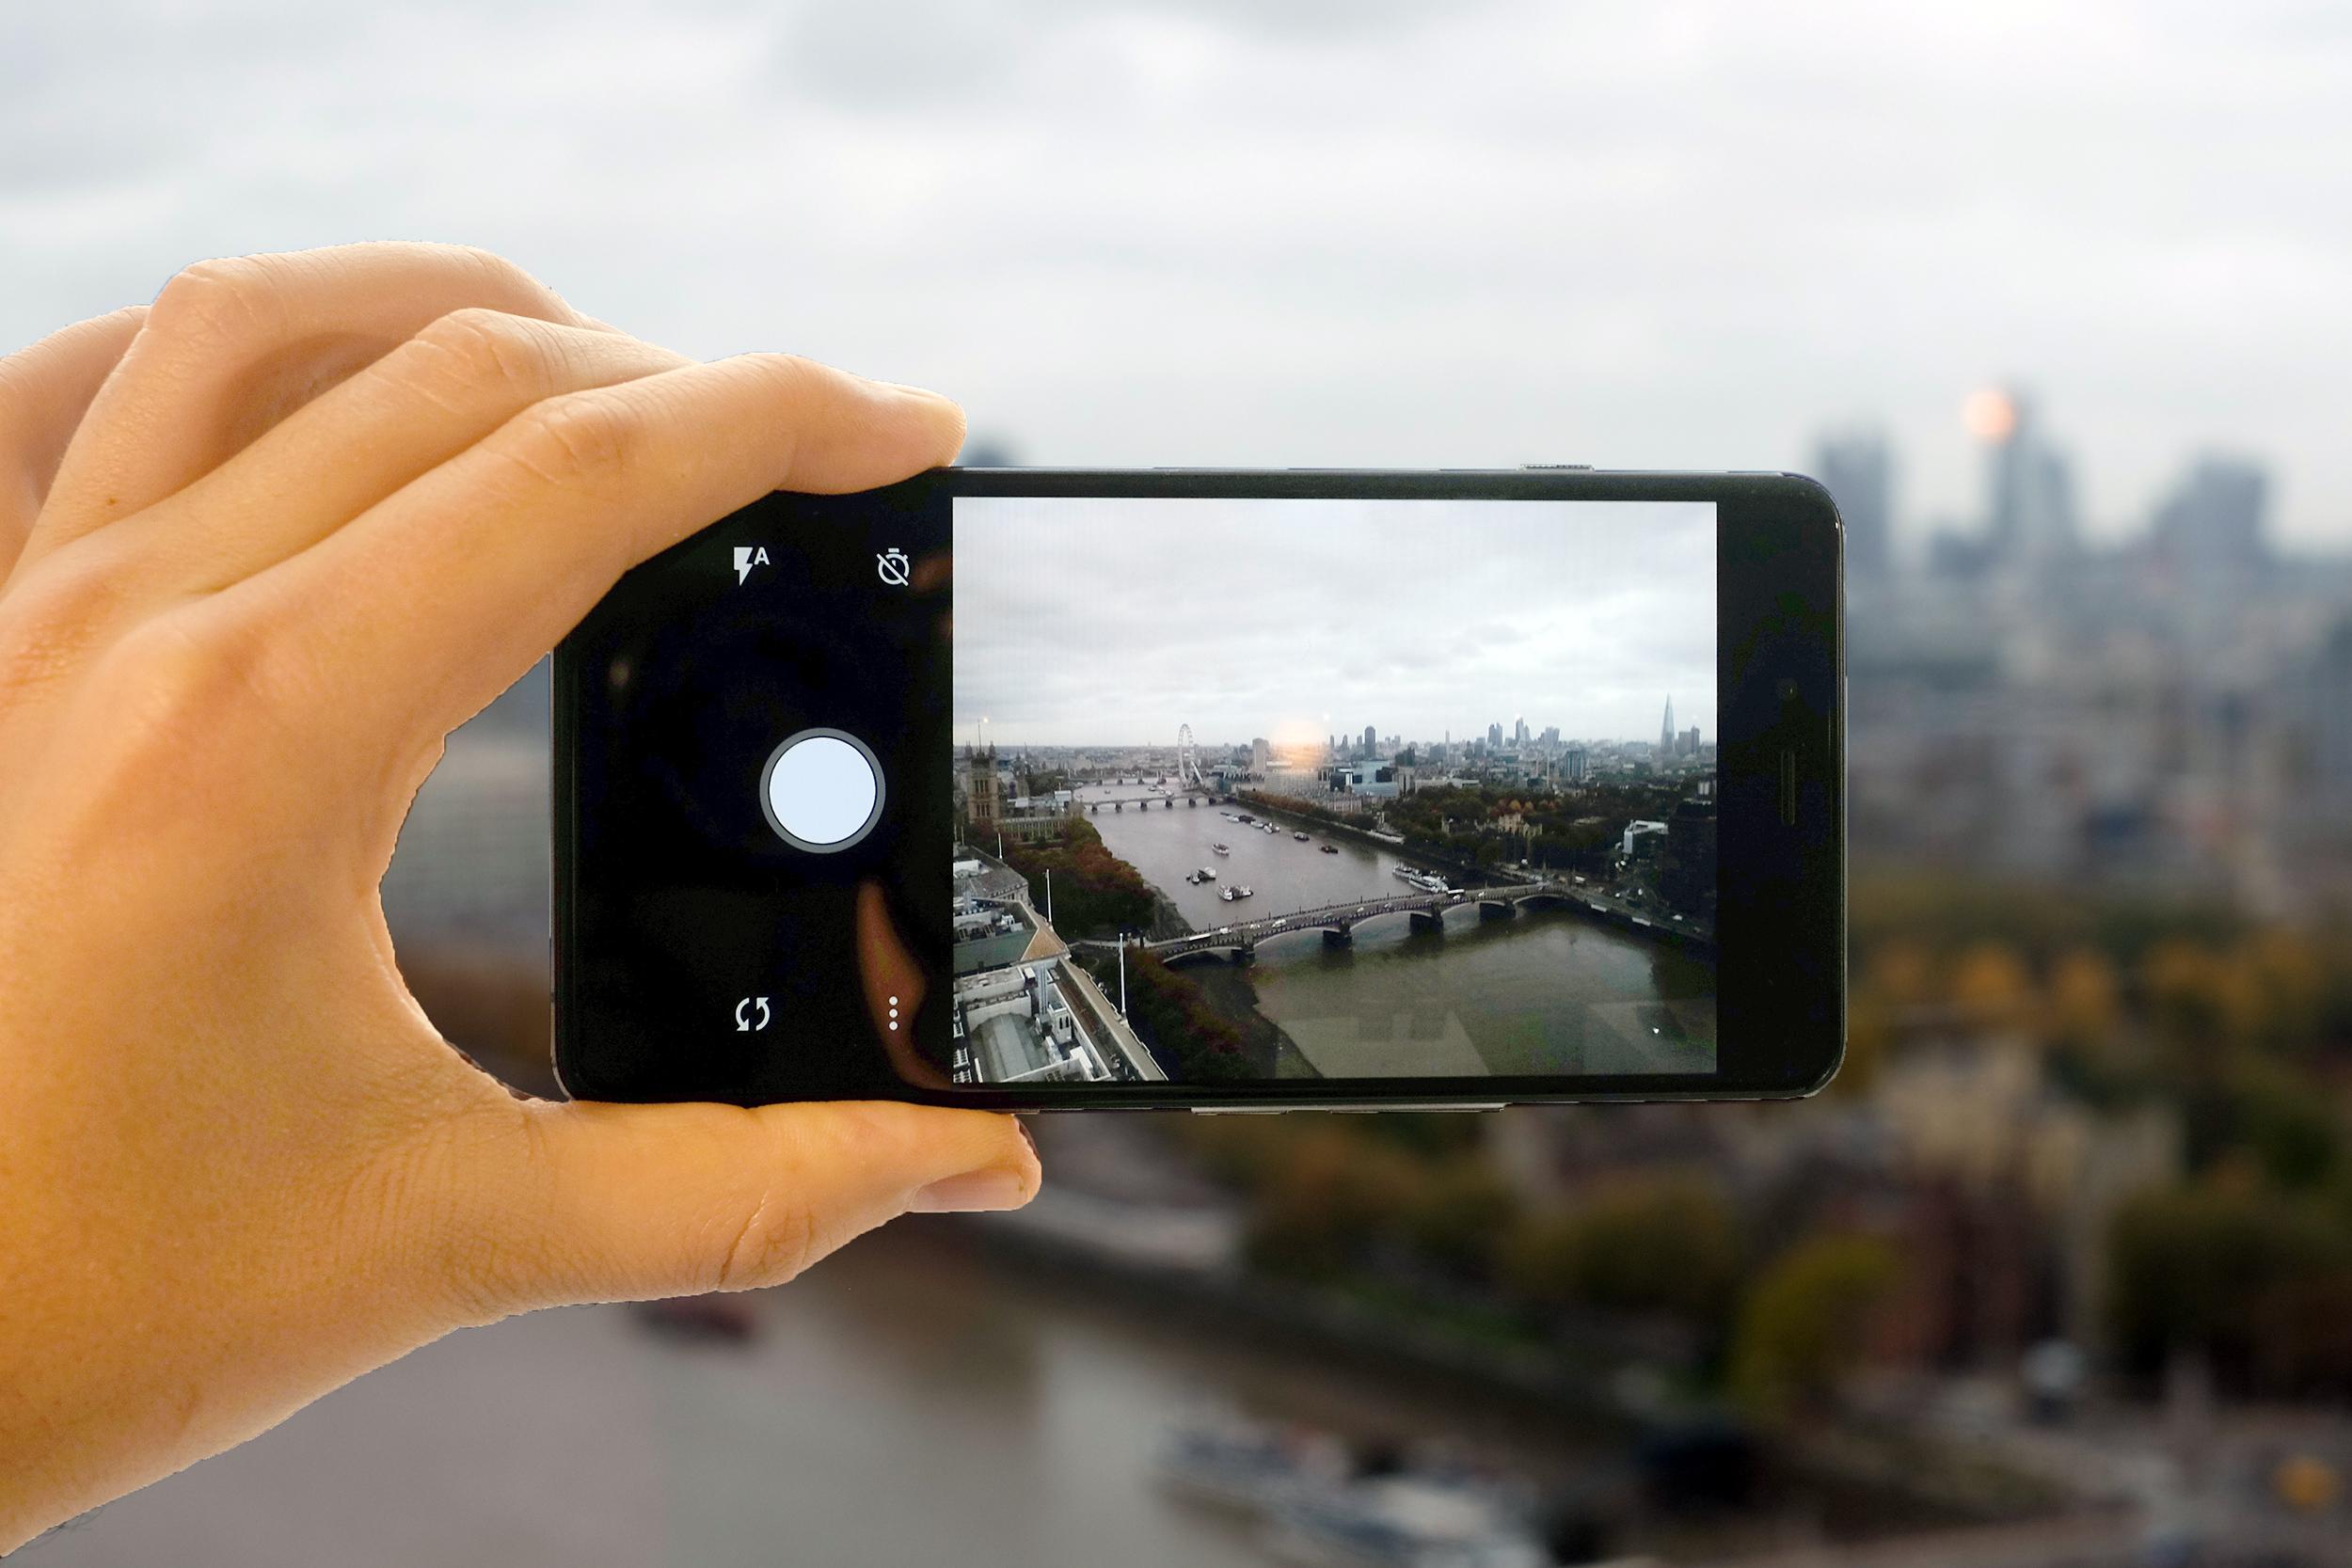 The OnePlus camera app.